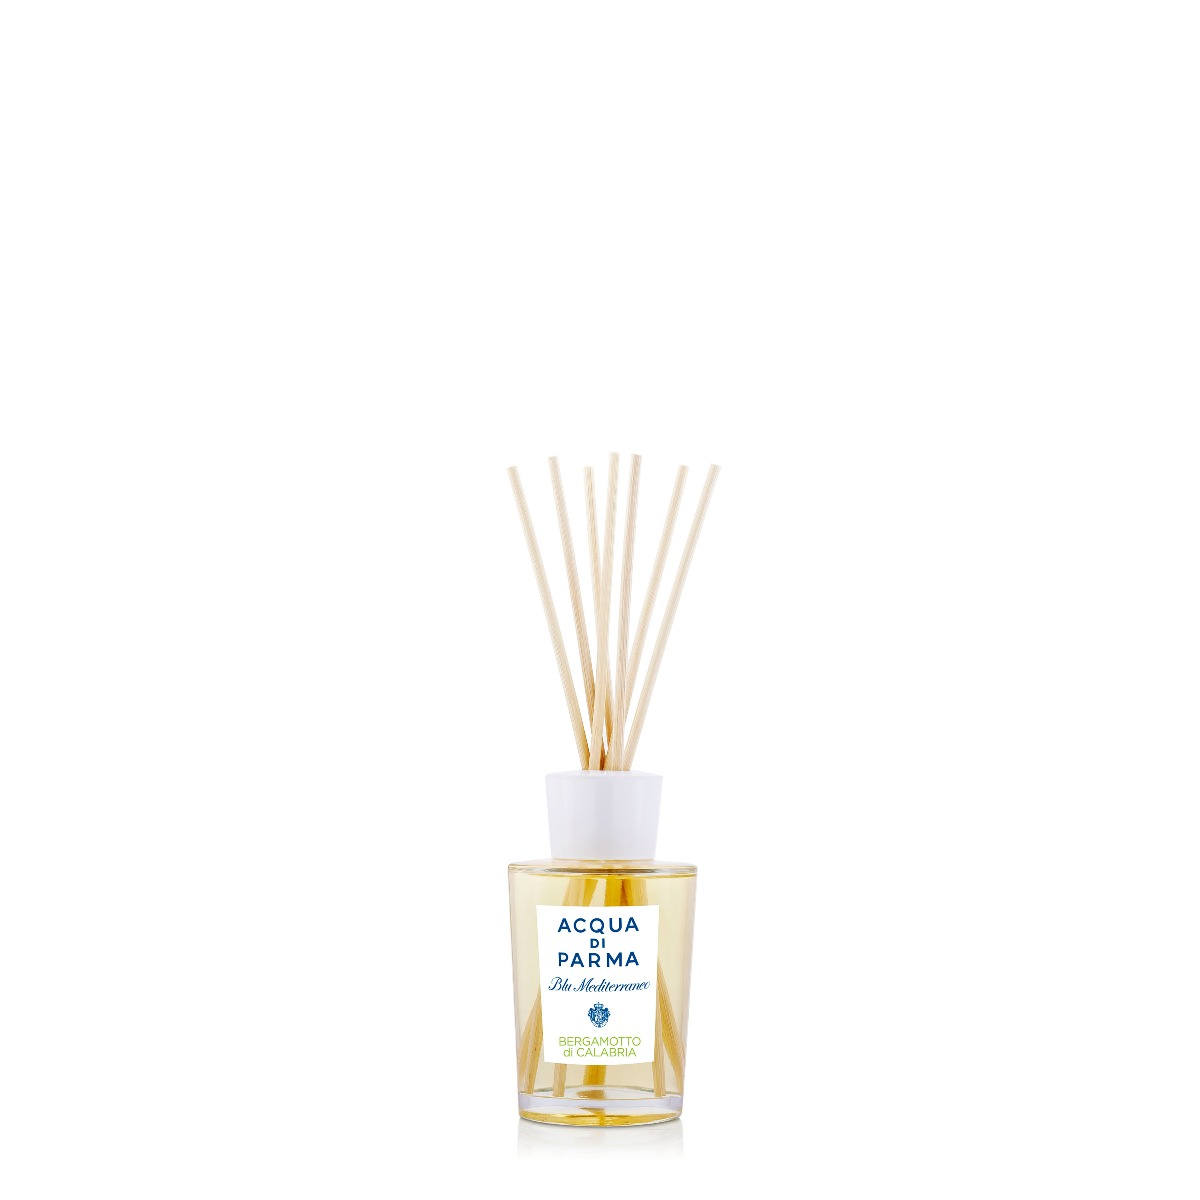 Dyfuzor zapachowy BM Bergamotto 180ml Miloo Home 62206